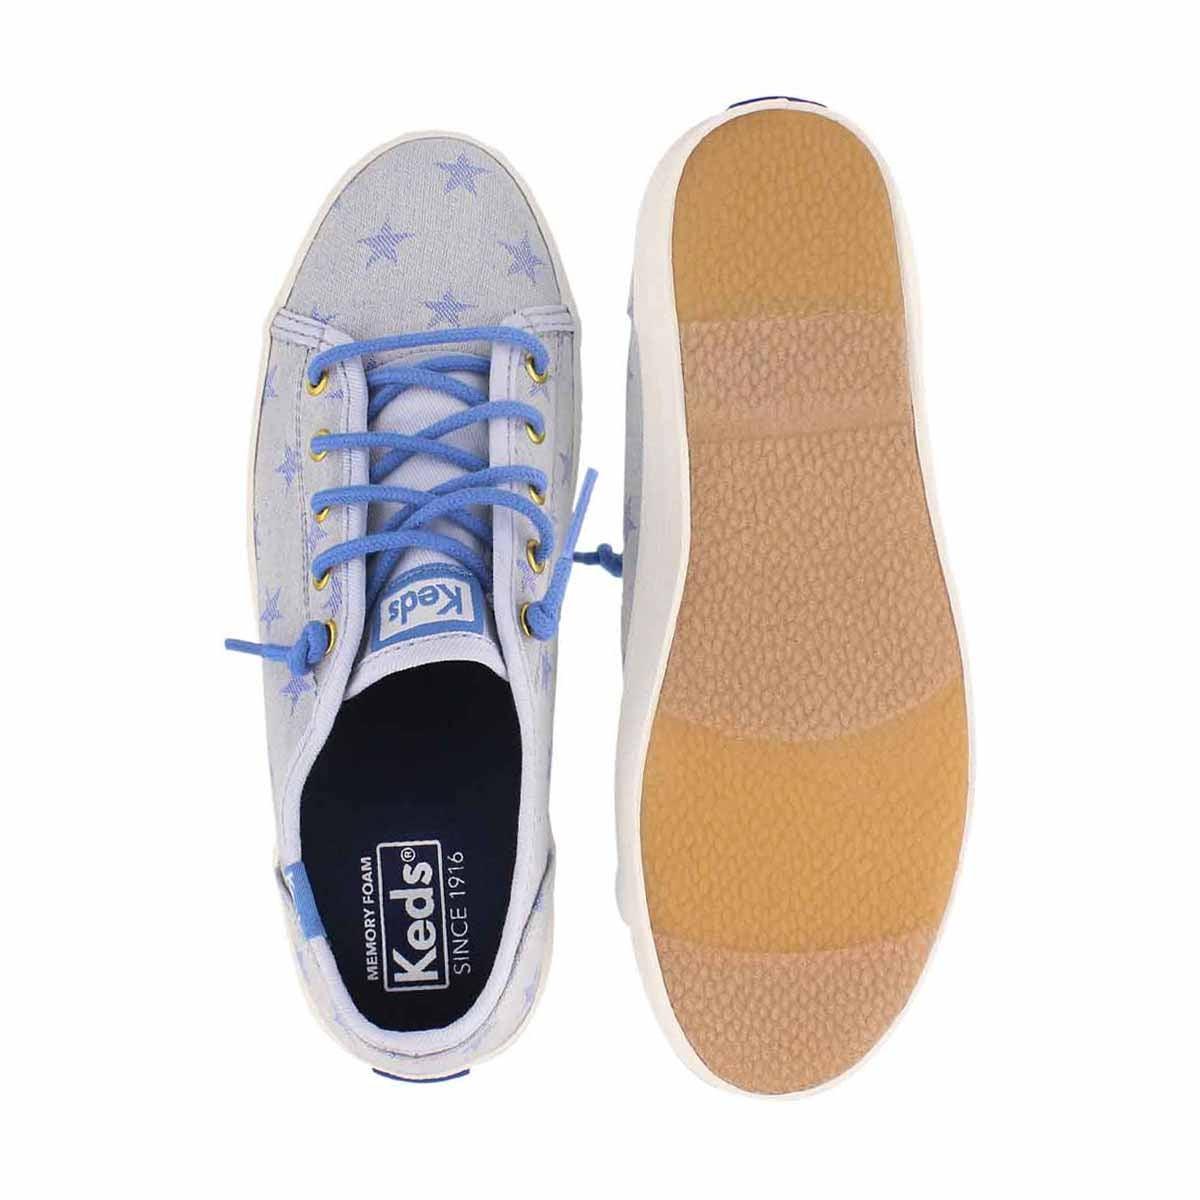 Grls Kickstart Seasonal star sneaker